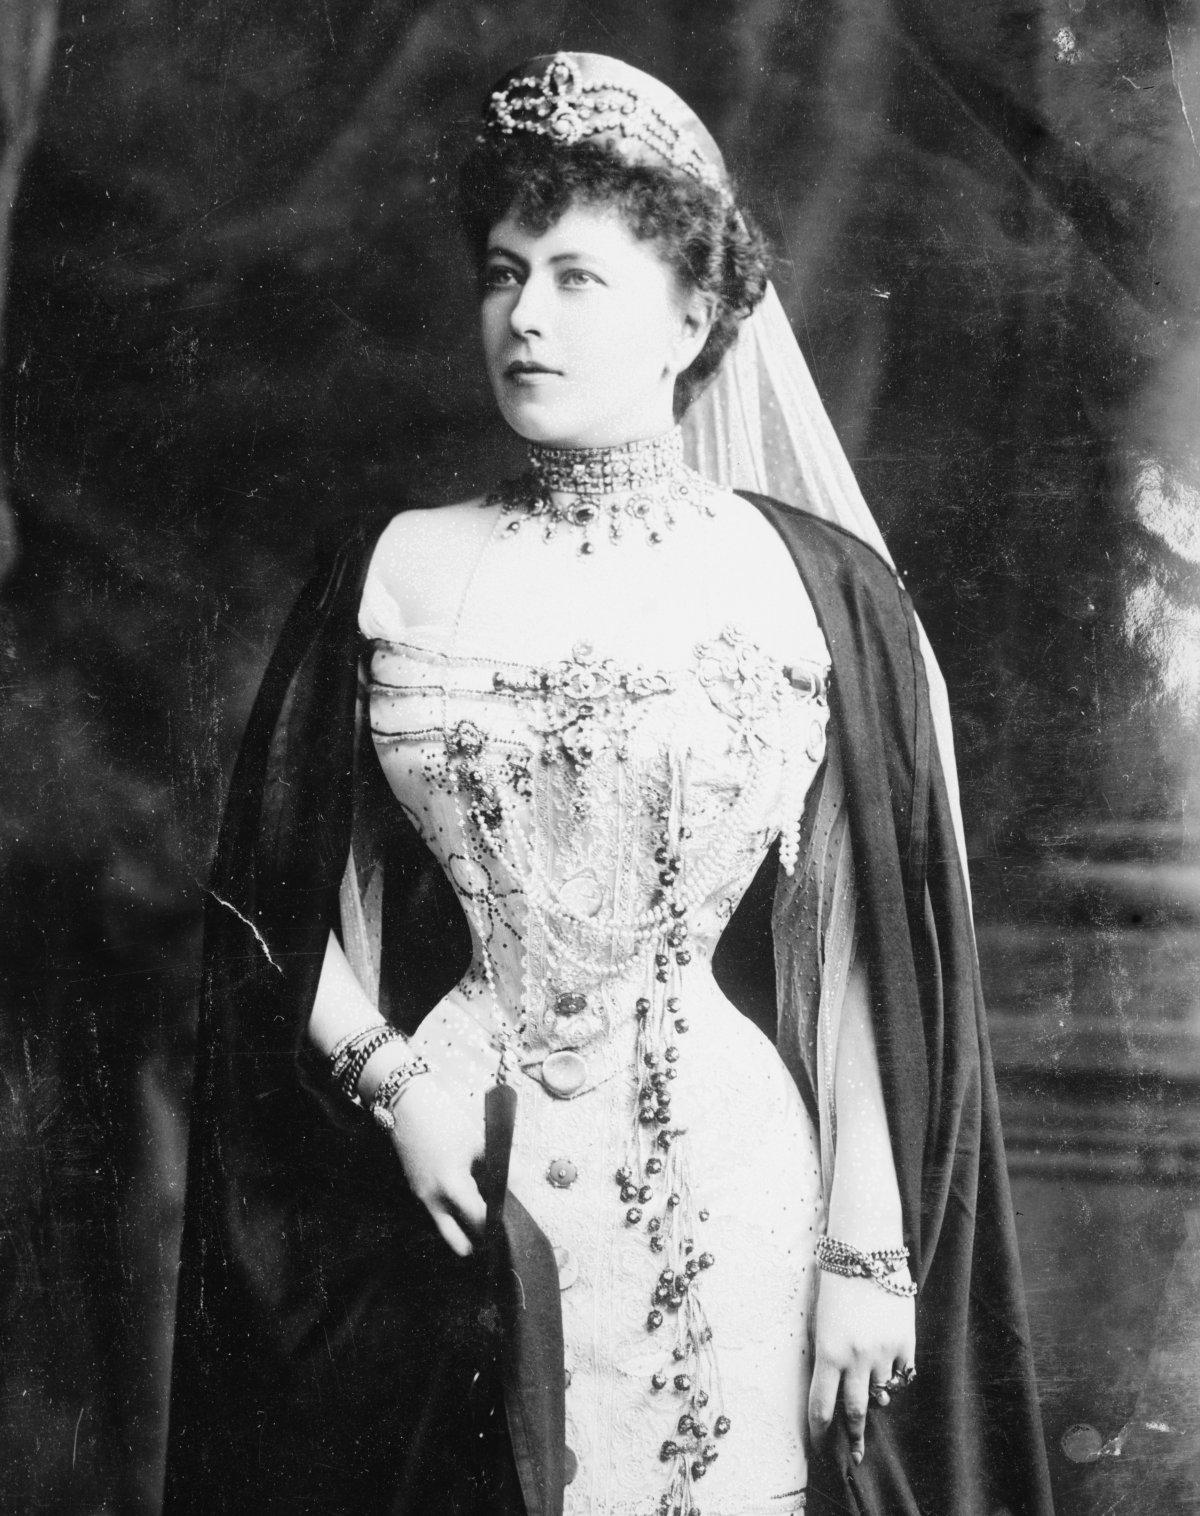 Countess Sophie of Merenberg, Countess de Torby, ca. 1902